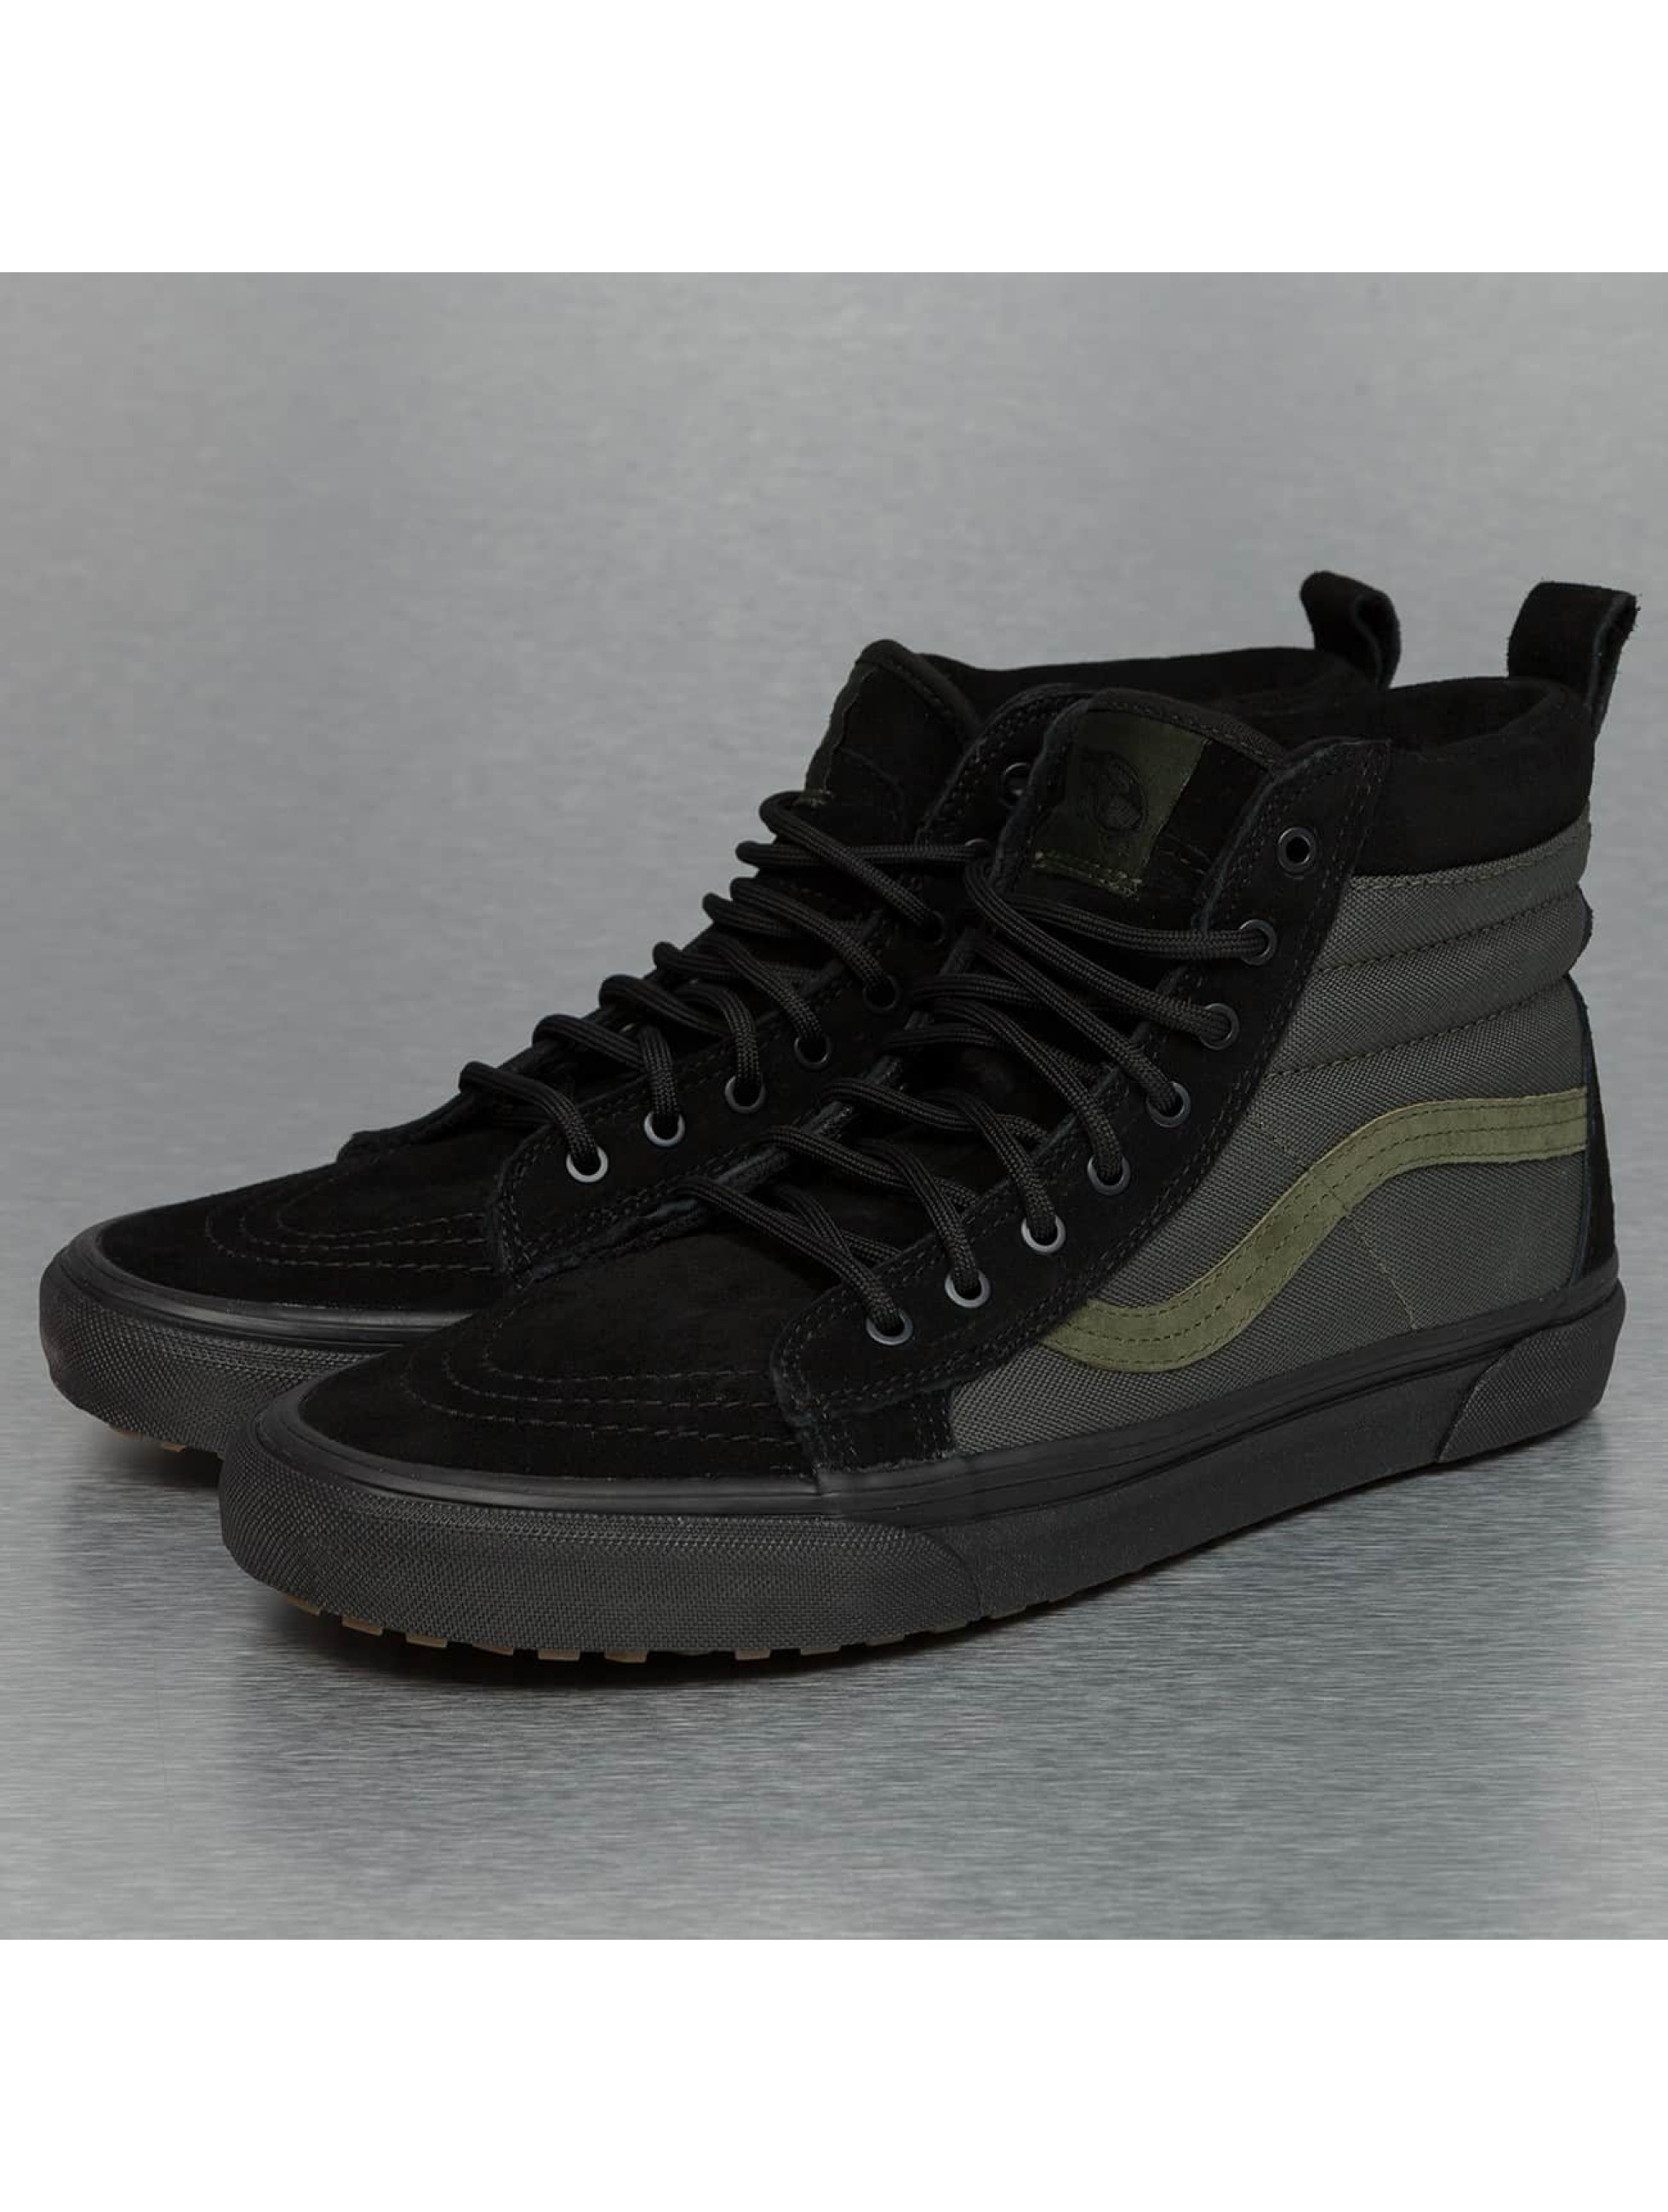 Sneaker SK8-Hi MTE in schwarz